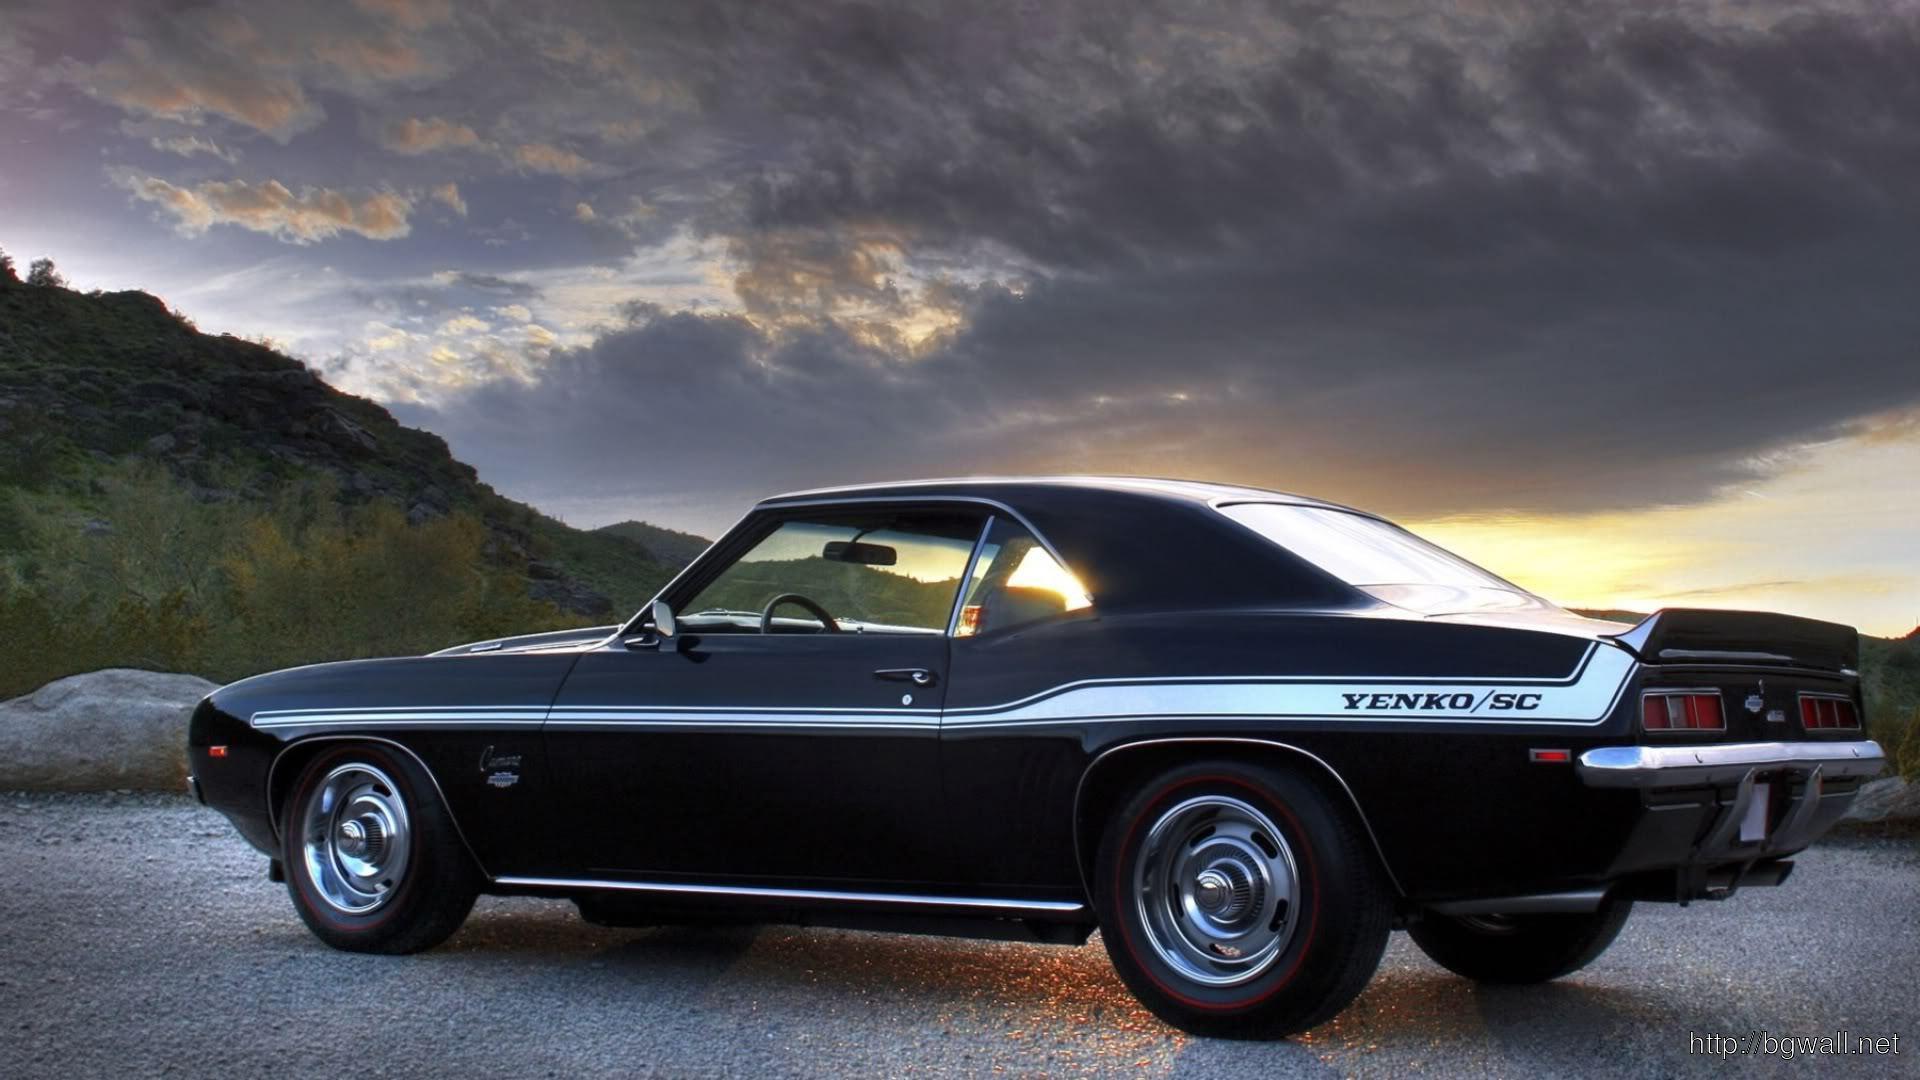 Camaro-1969-High-Resolution-Wallpaper